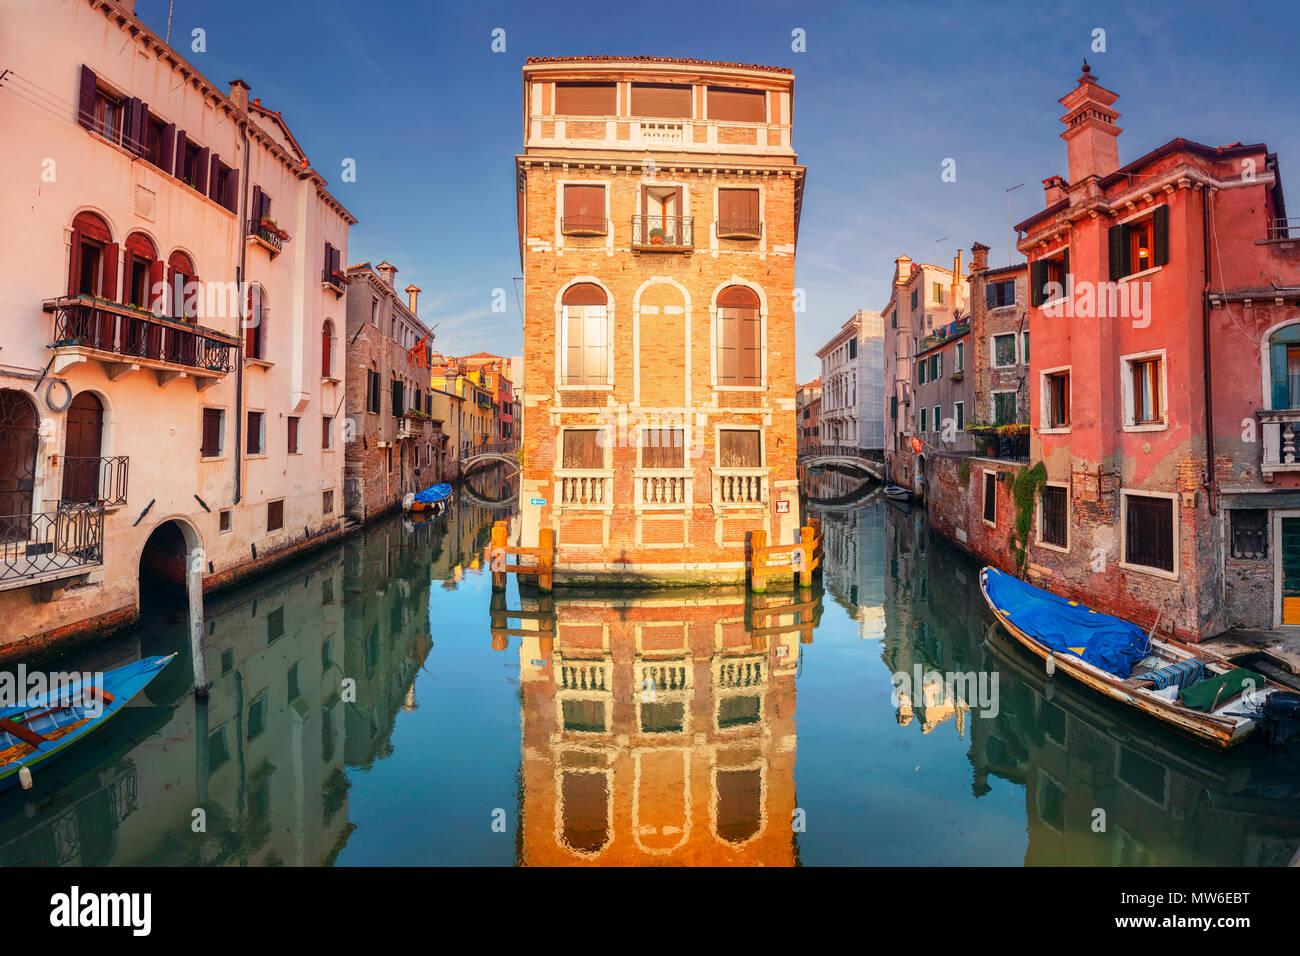 Venedig. Stadtbild Bild der engen Kanäle in Venedig während des Sonnenuntergangs. Stockbild